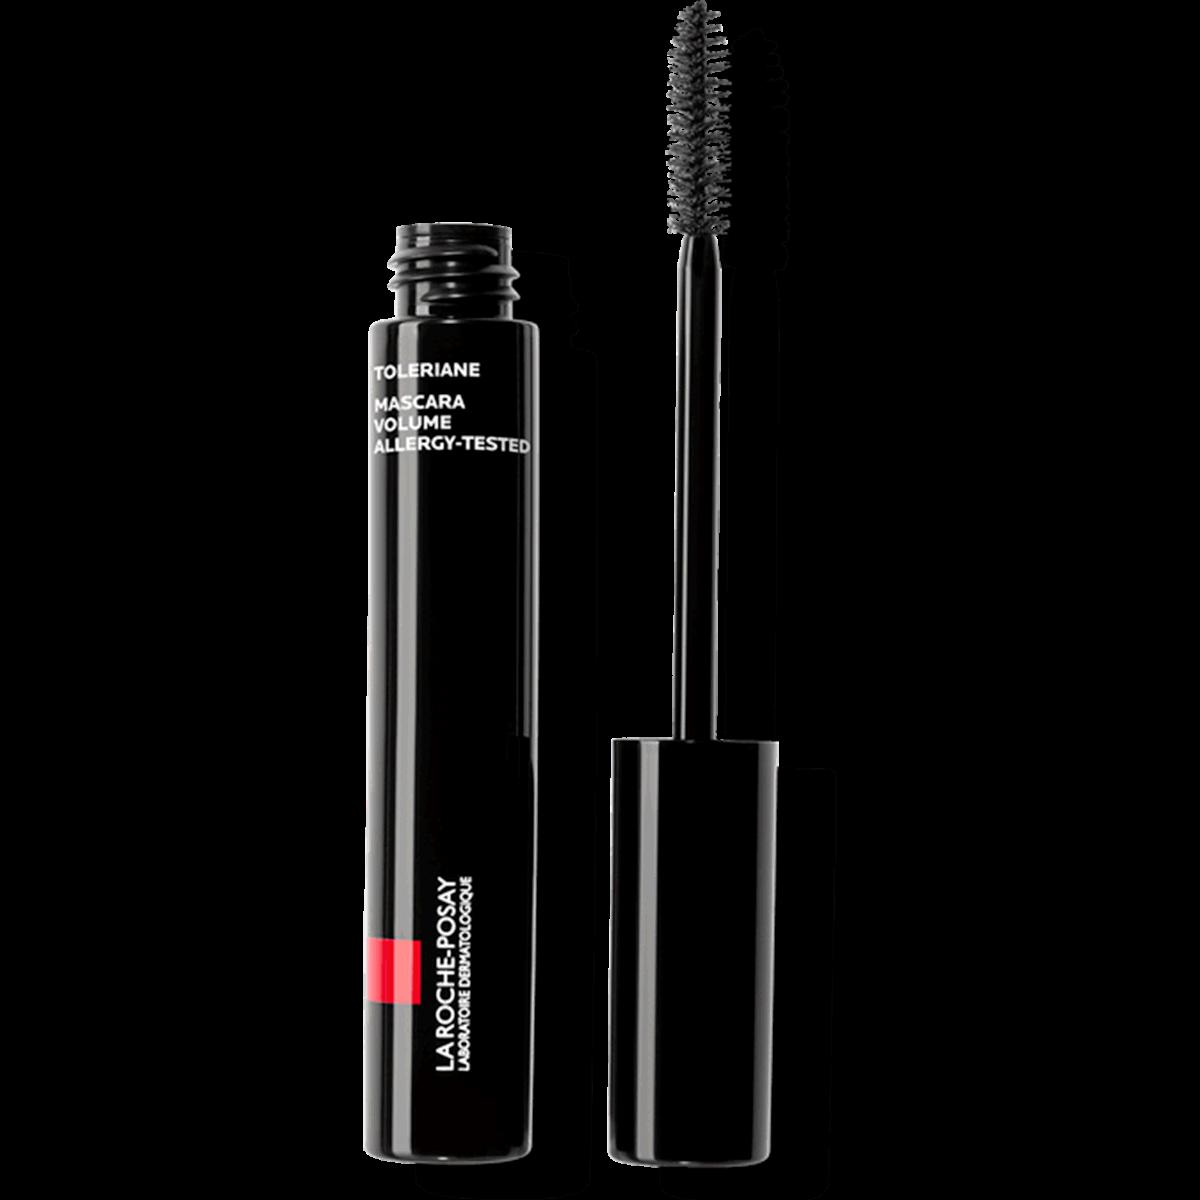 La Roche Posay Herkkä Toleriane Make up VOLUME MASCARA Black 333787